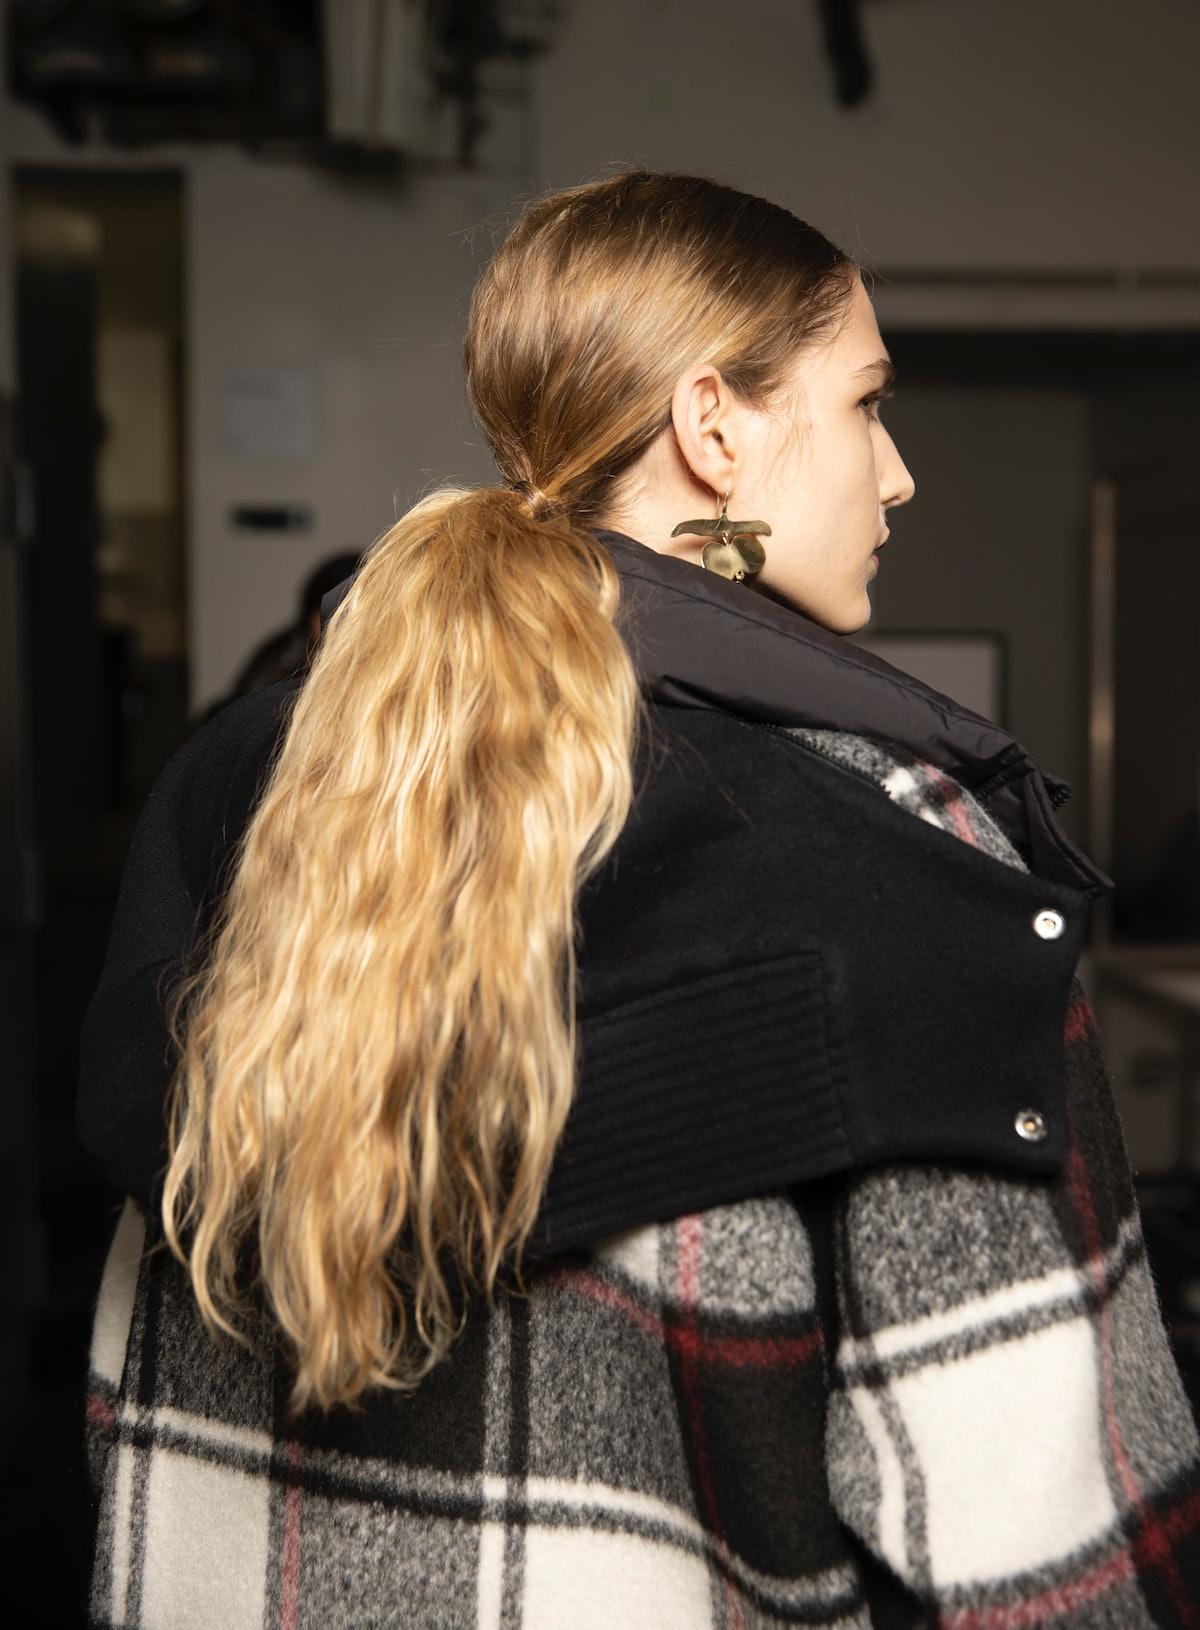 Jason Wu Fall/Winter 2021 show ponytail hair.